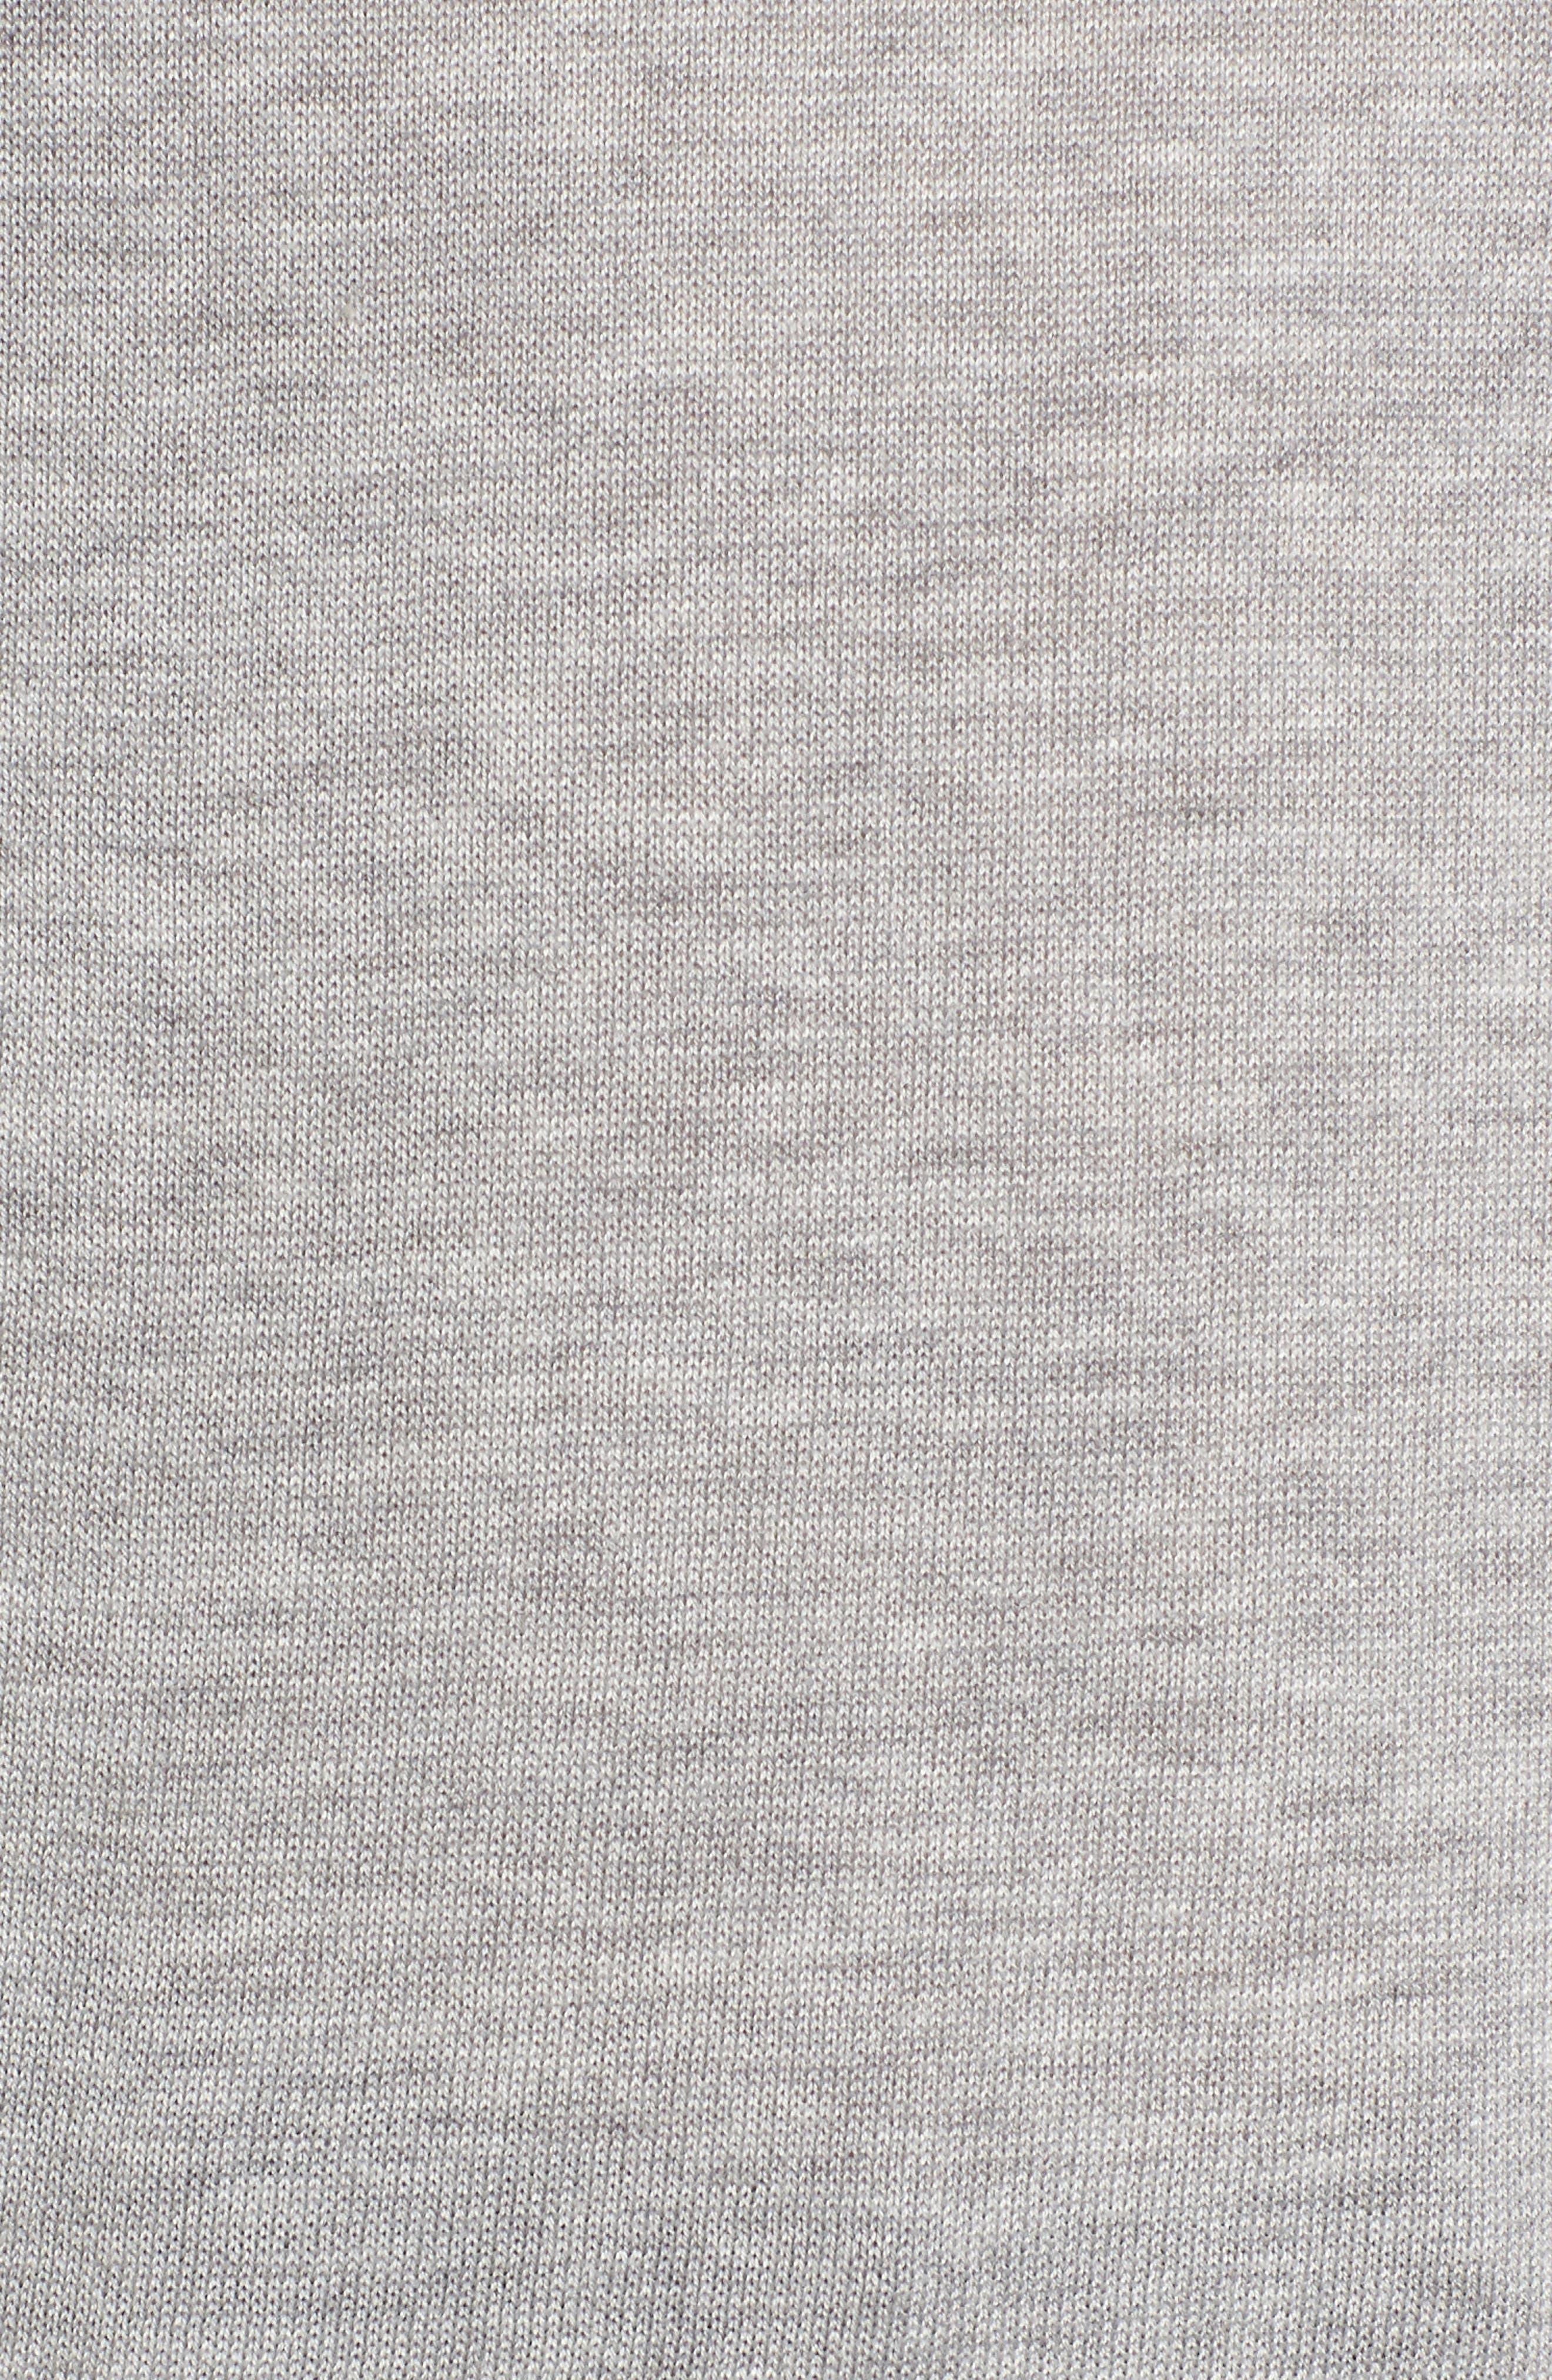 Ruffle Sleeve Sweater,                             Alternate thumbnail 5, color,                             Grey Heather